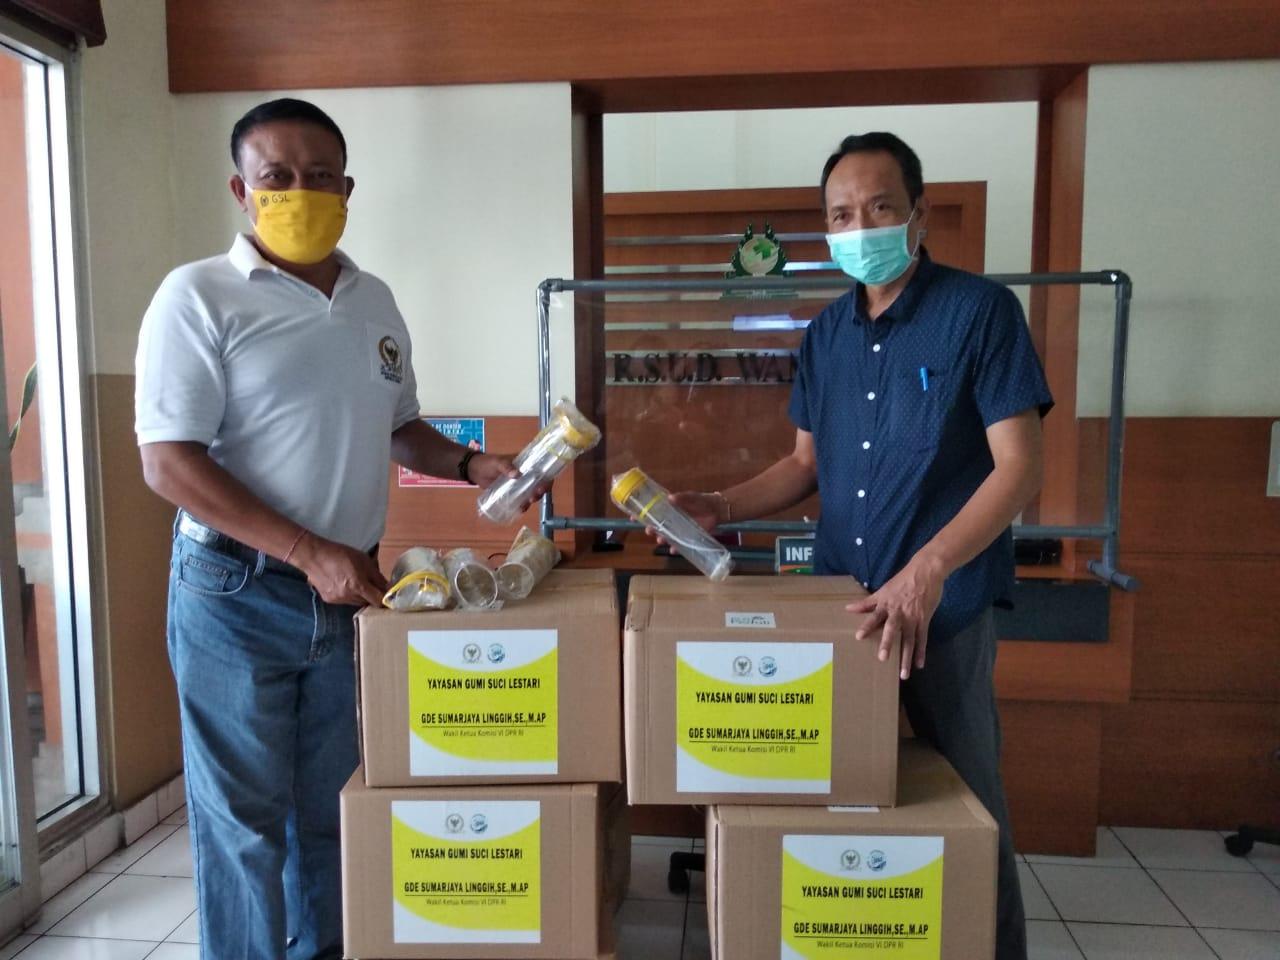 GDE Sumarjaya Linggih alias Demer saat menyerahkan bantuan APD untuk RS Wangaya, Denpasar, Rabu (6/5/2020). Foto: Ist